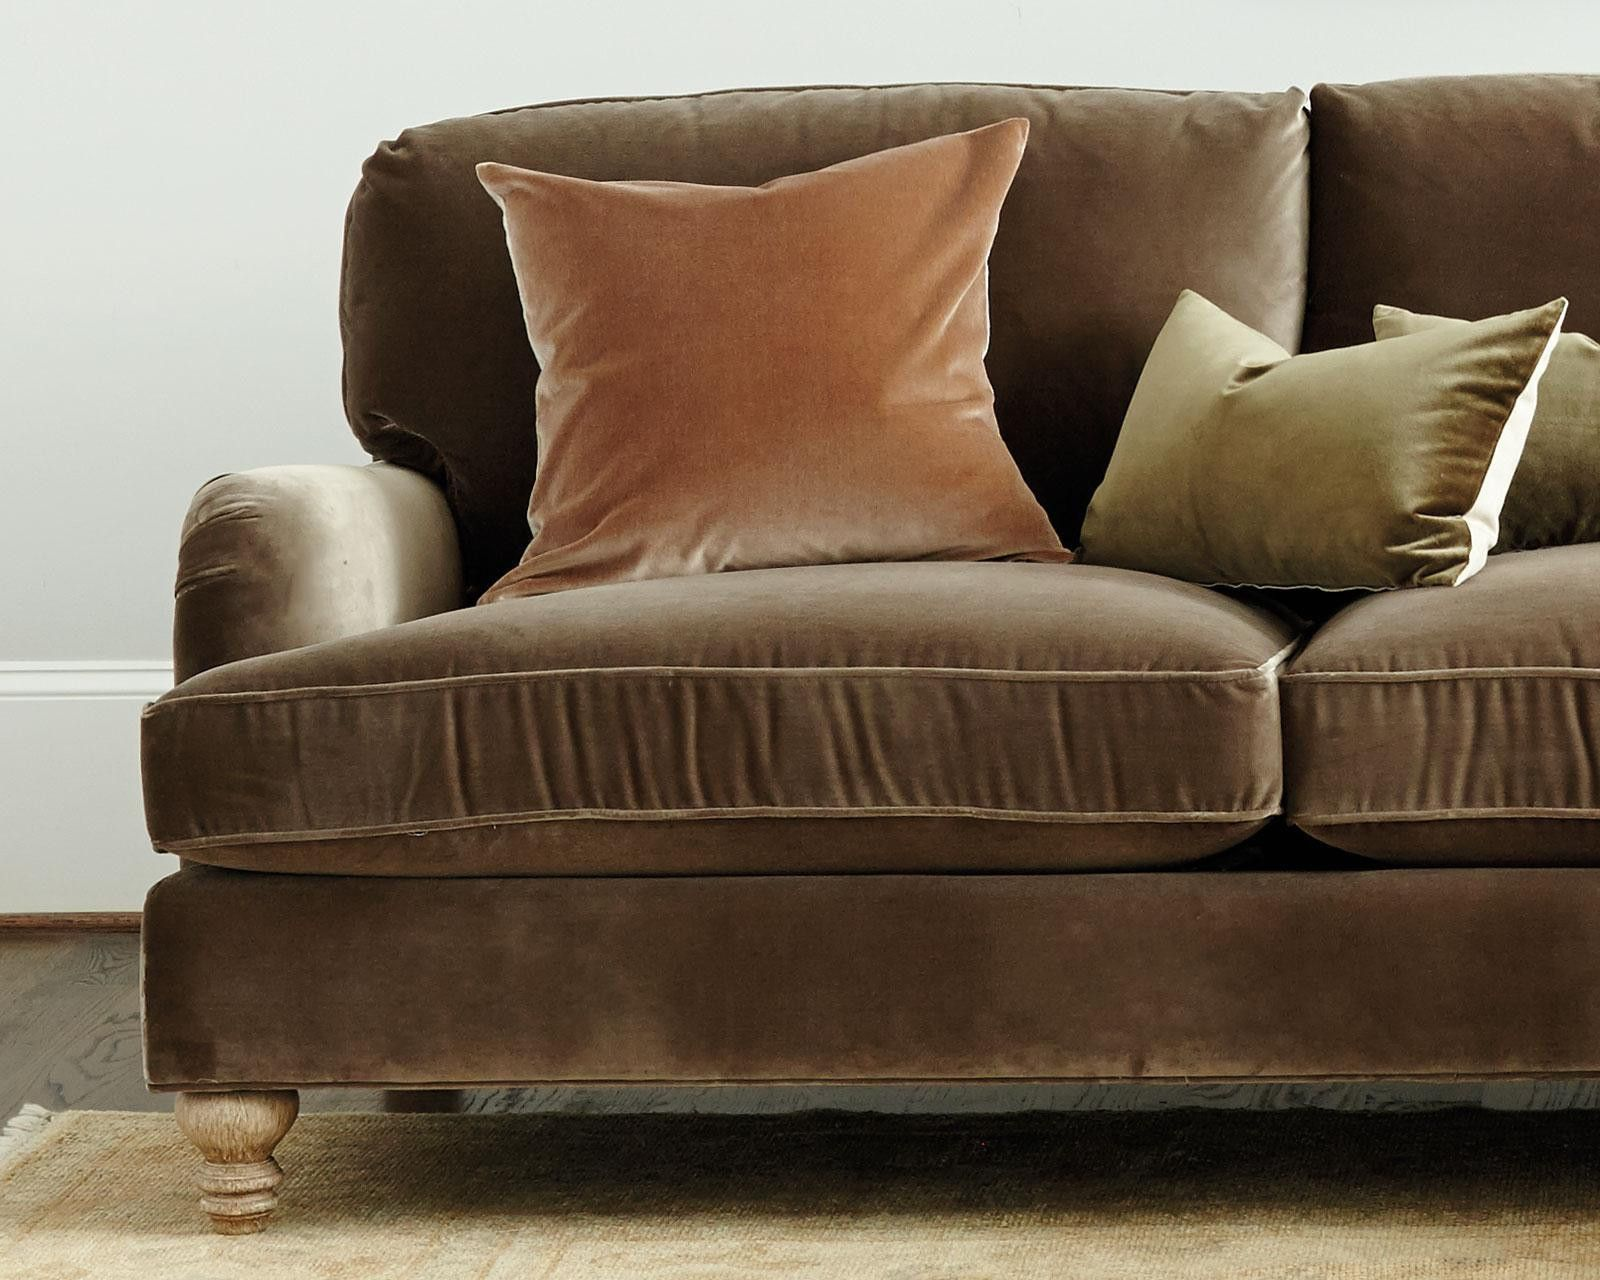 14 Trendy Metallic Decorative Pillows in 2020 Cushions